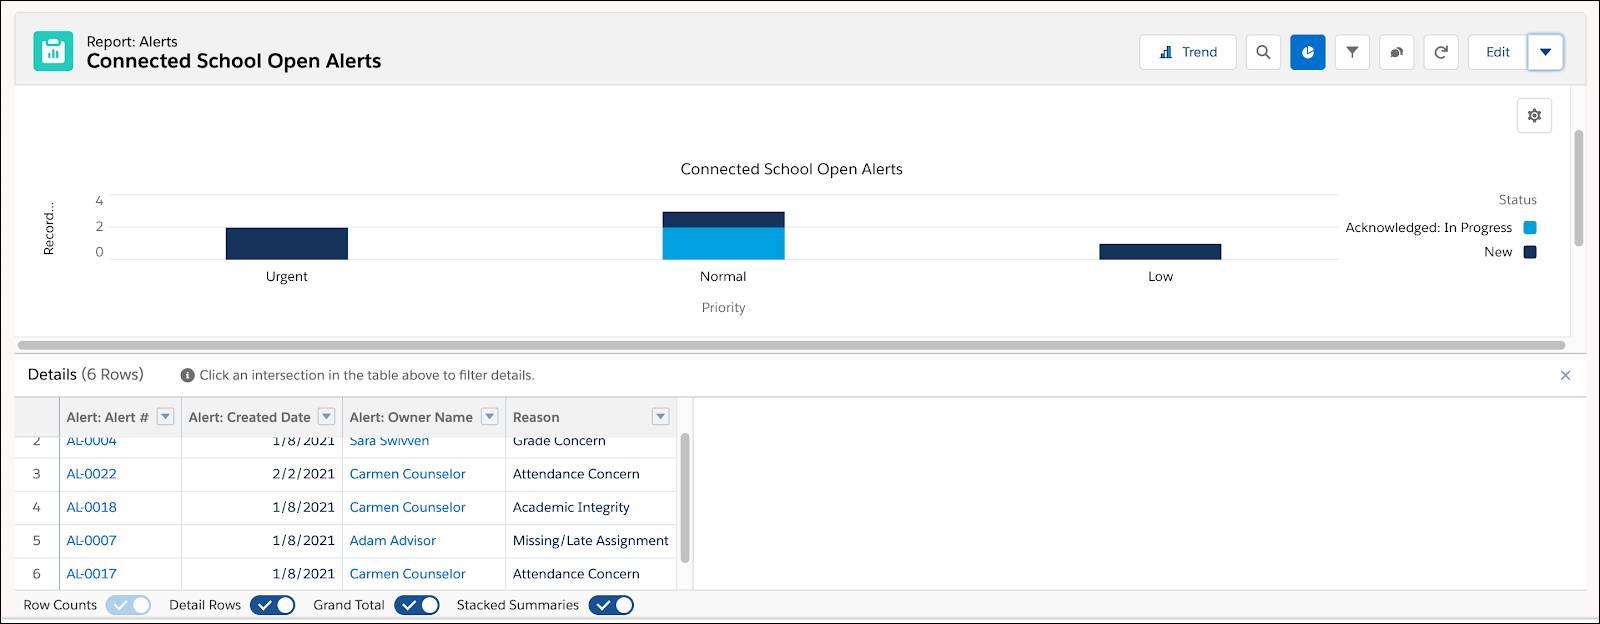 Report for Connected School Open Alerts